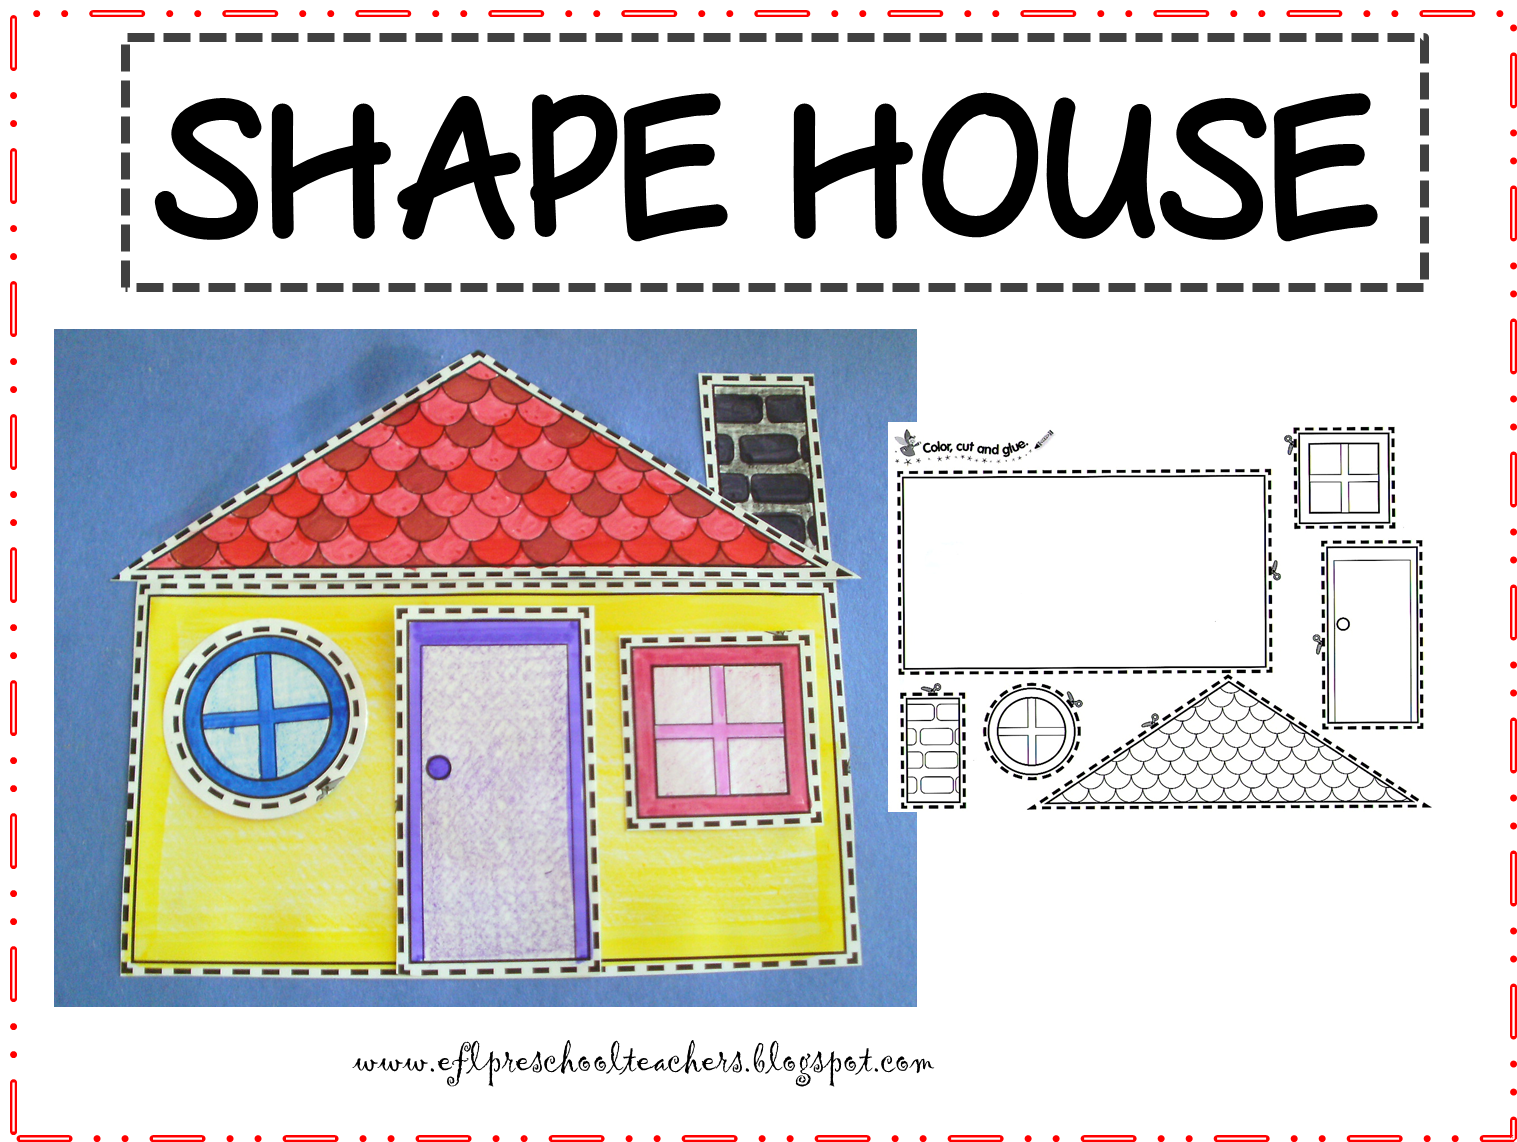 Esl efl preschool teachers house resources for preschool ela for Different shapes of houses